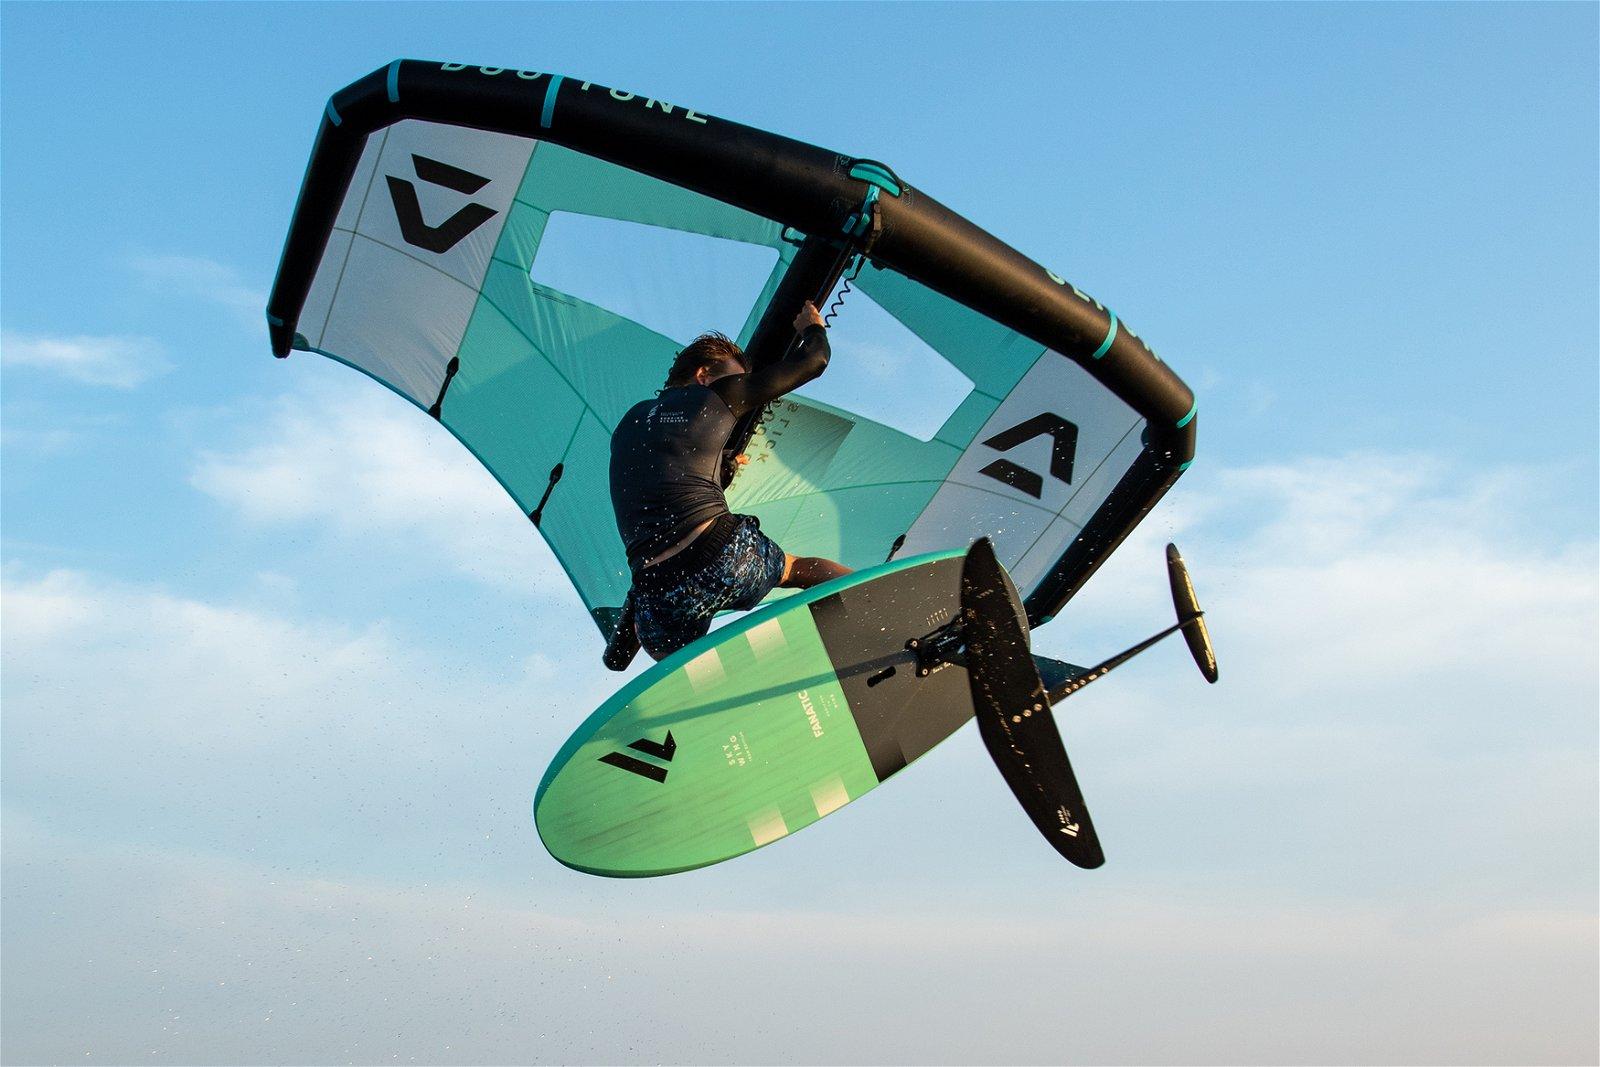 KlaasVoget SLICK22 SkyWingTE22 AeroHighAspectCarbon KleinesMeer by FemkeVoget Duotone-7614